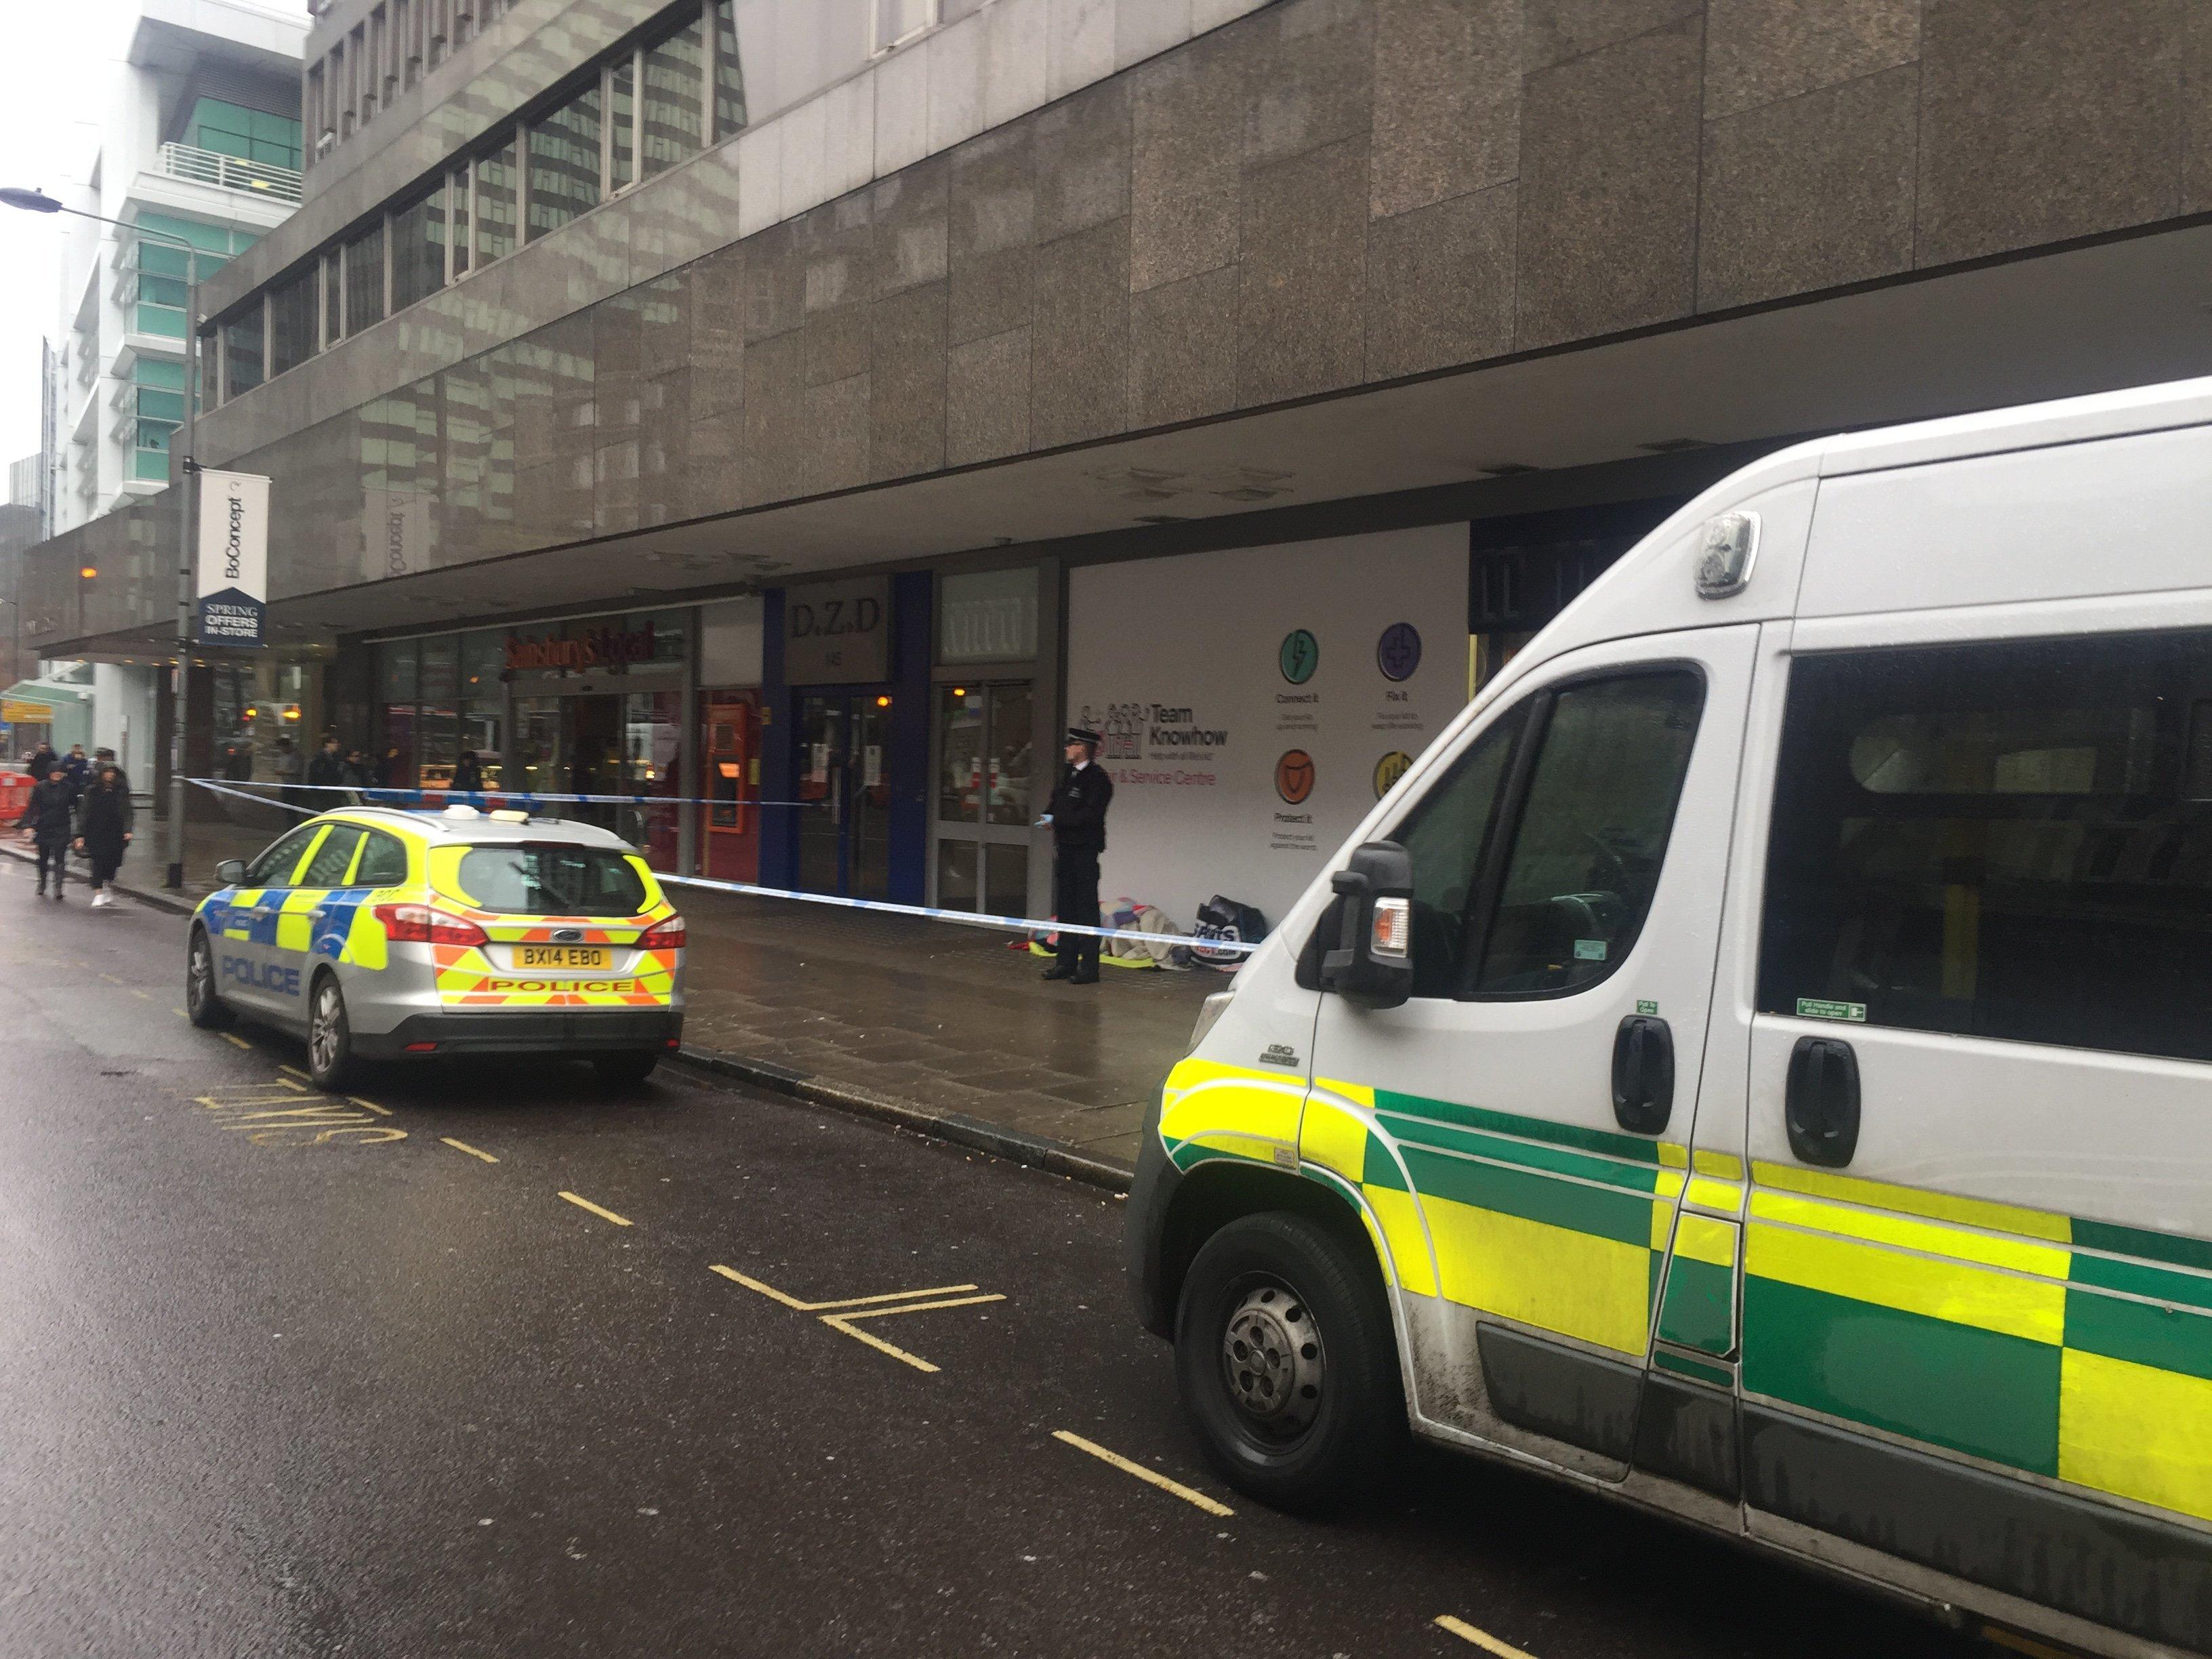 Police guard the body of arough sleeperwho diedon Tottenham Court Road overnight on